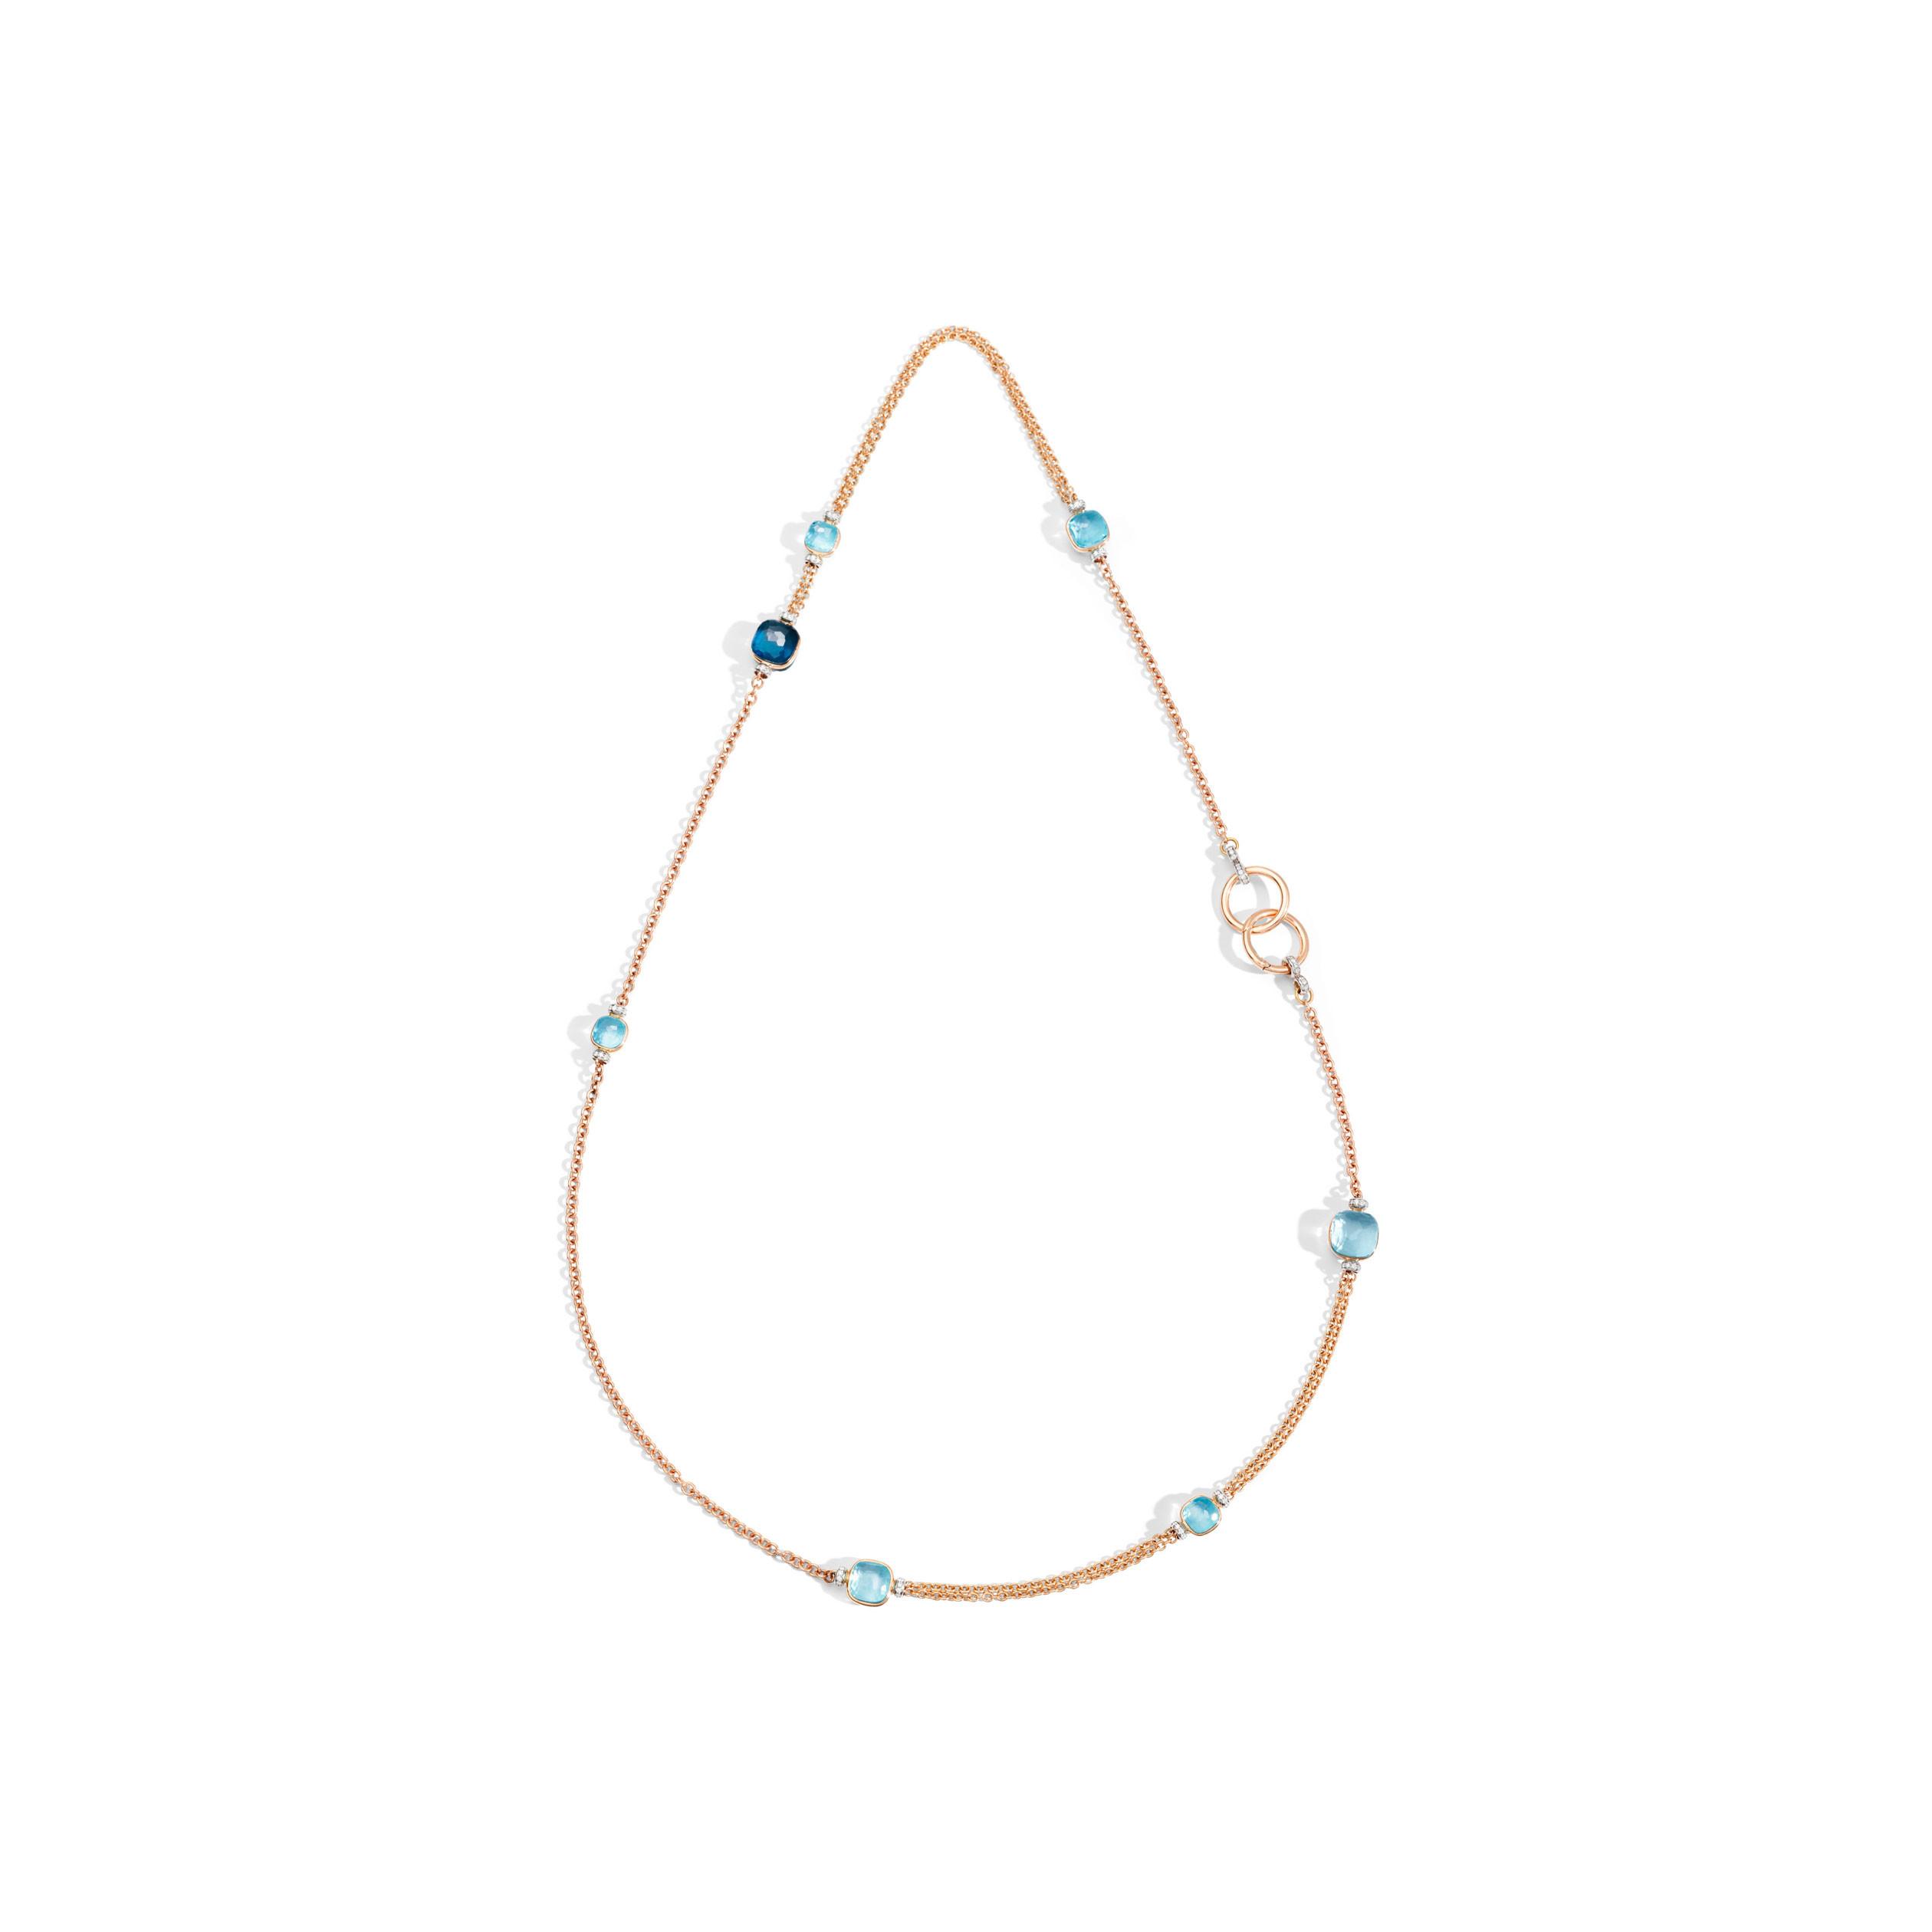 Pomellato > NUDO > O-B601-O6-TB - Juwelier Rüschenbeck